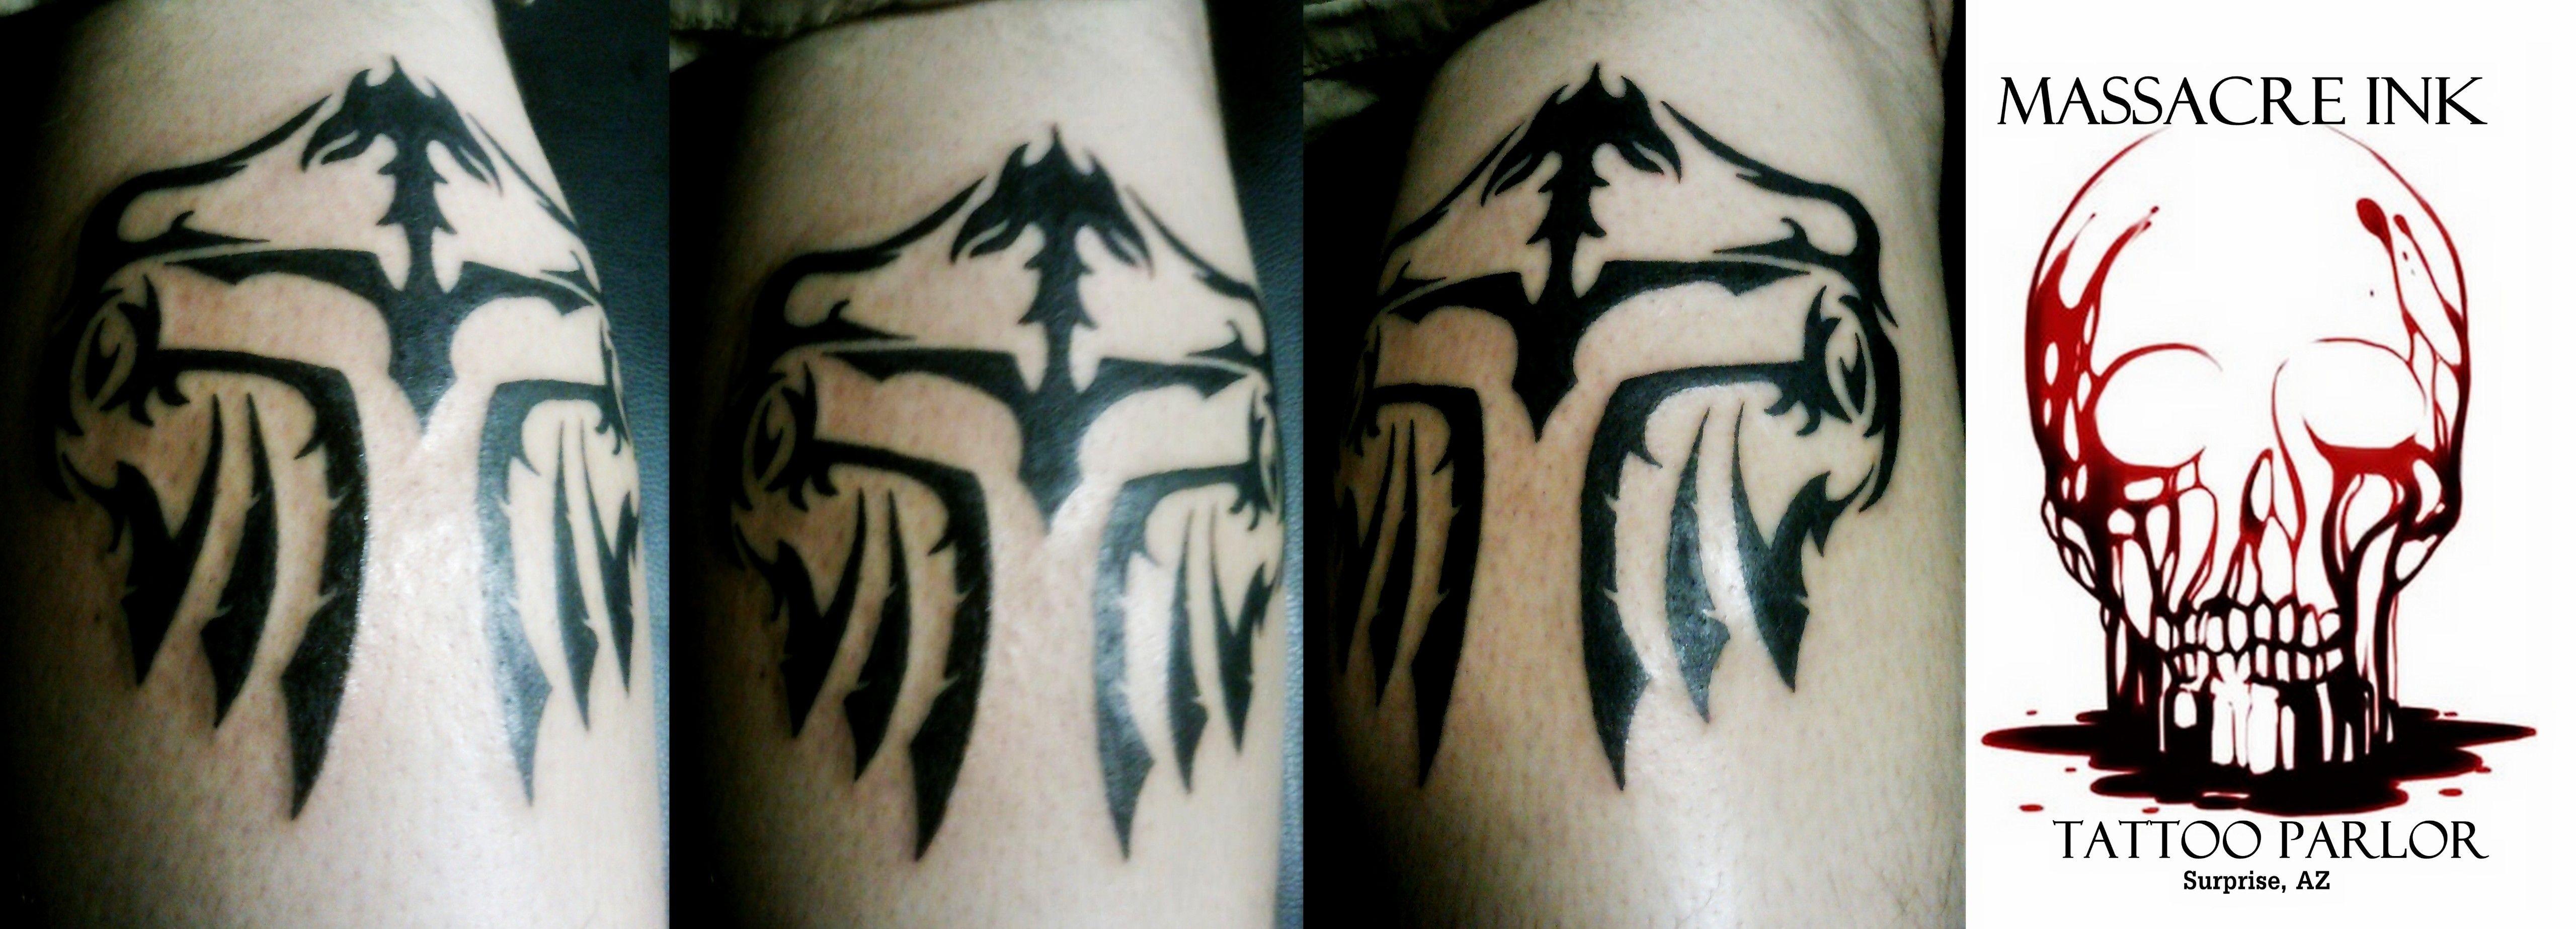 Spartan Tribal Symbol For Victory Massacre Ink Tattoos Pinterest